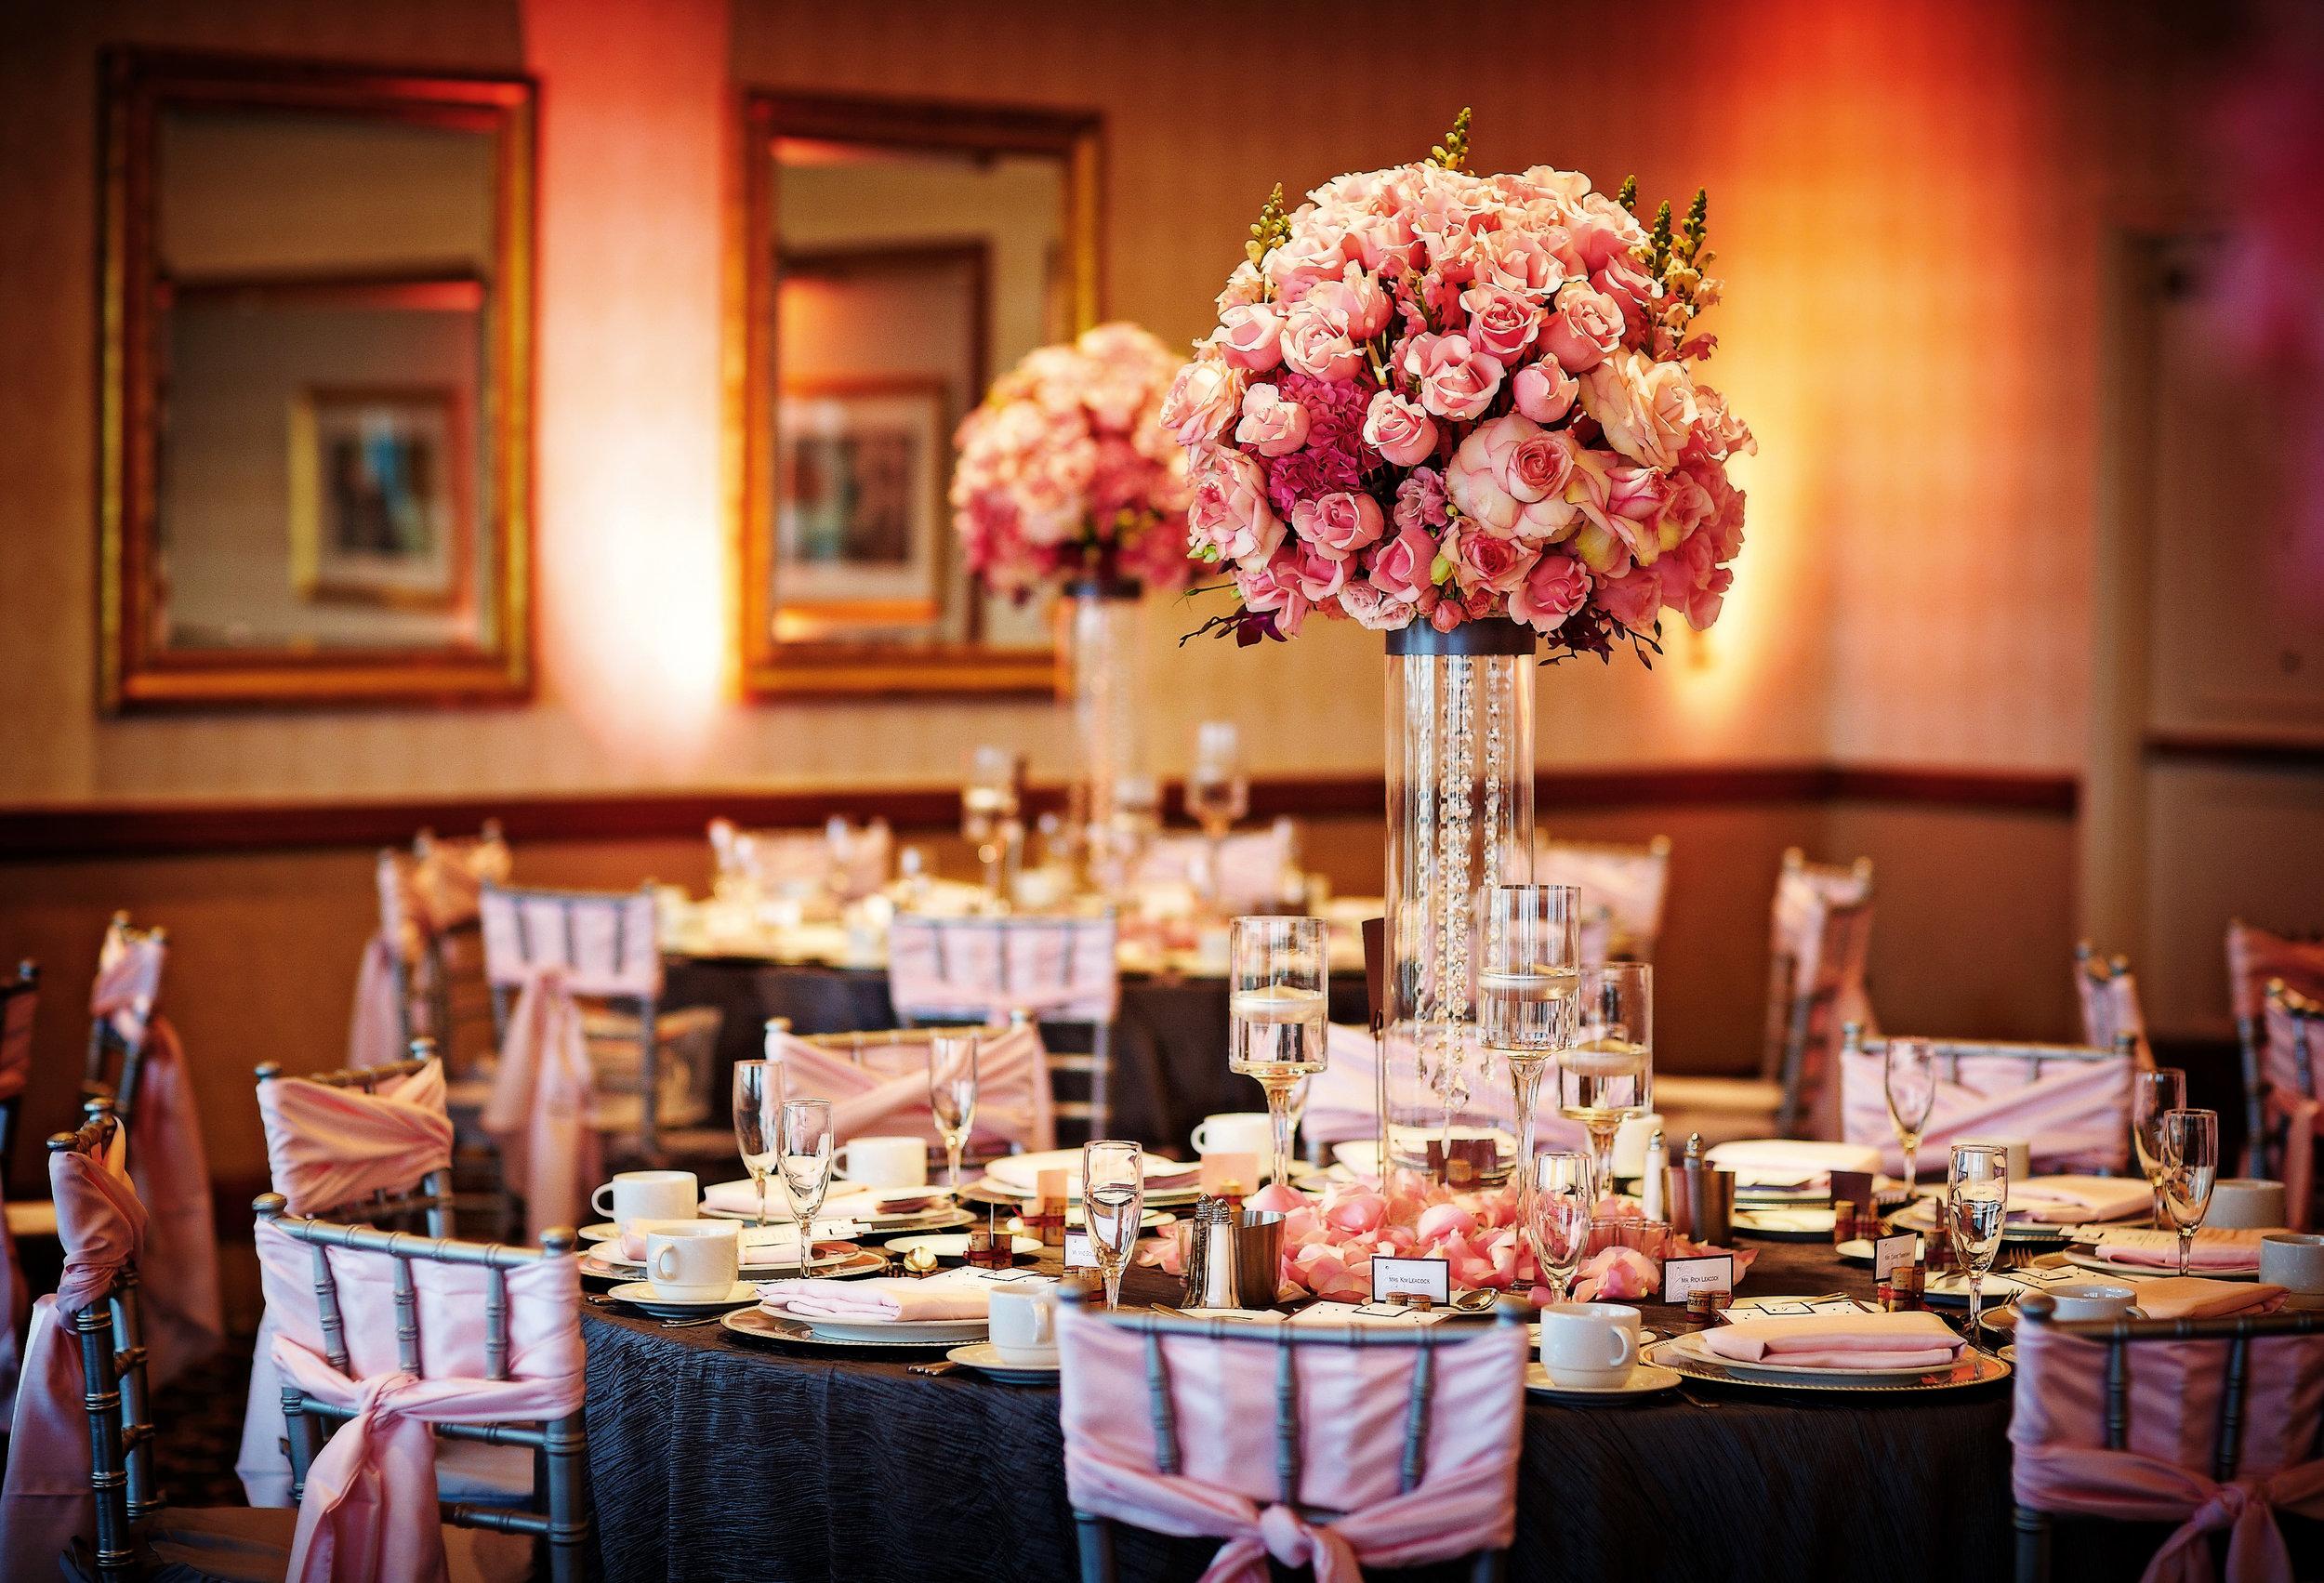 stunning-wedding-event-planning-wedding-planning-greenbloom-concepts.jpg